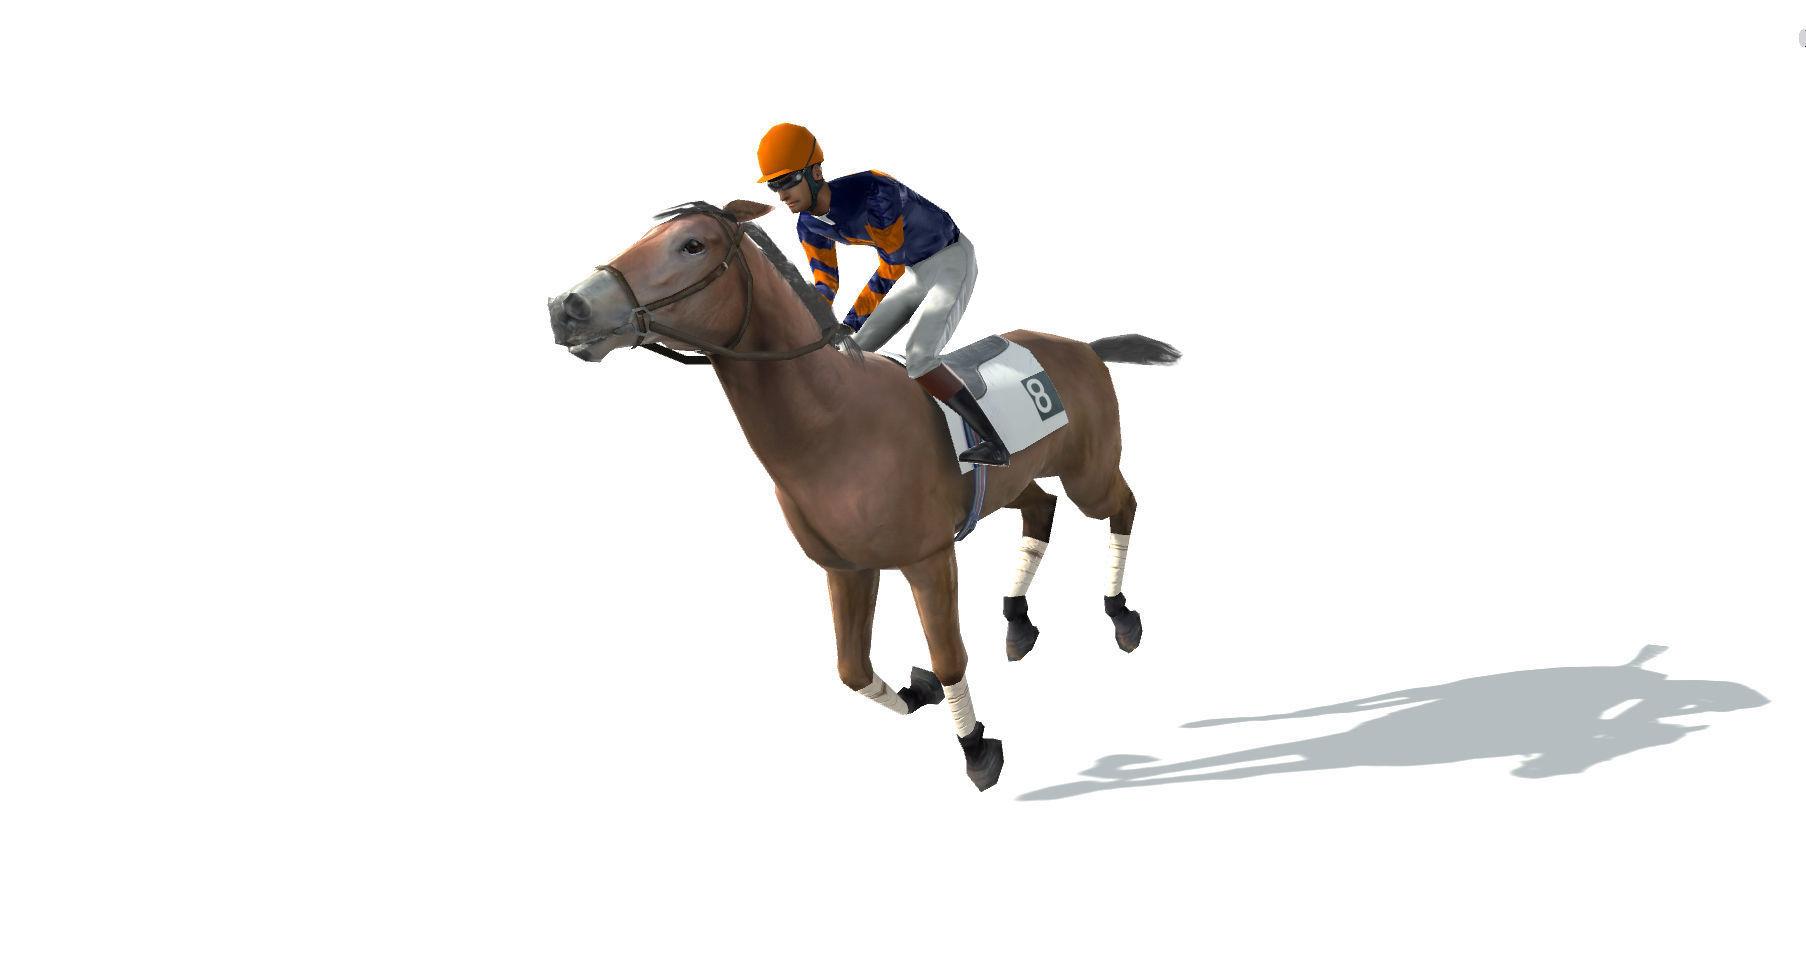 Race Horse and Jockey with LOD